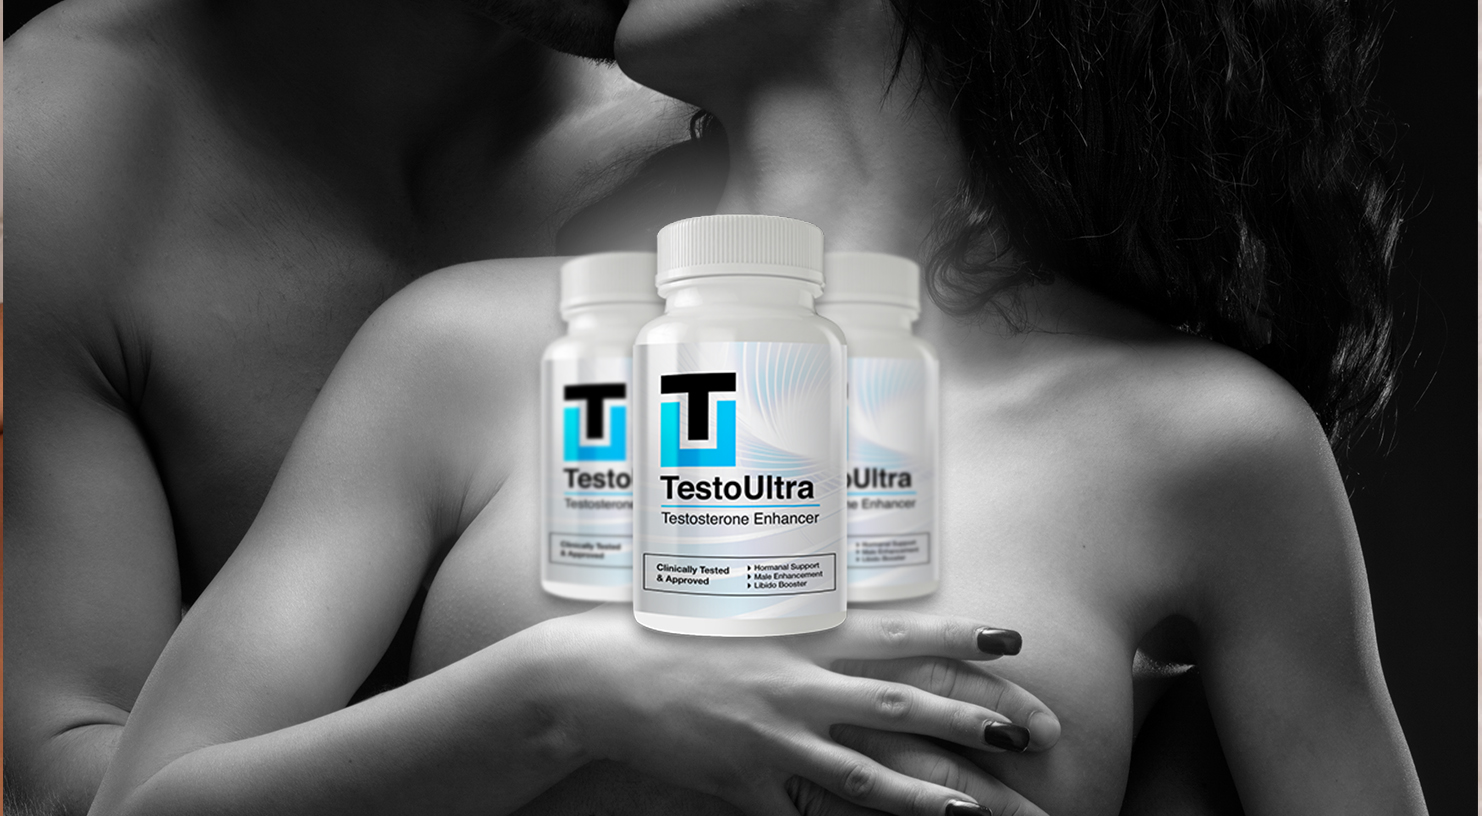 Testo Ultra Malaysia & Singapore Price - Buy Pills Online